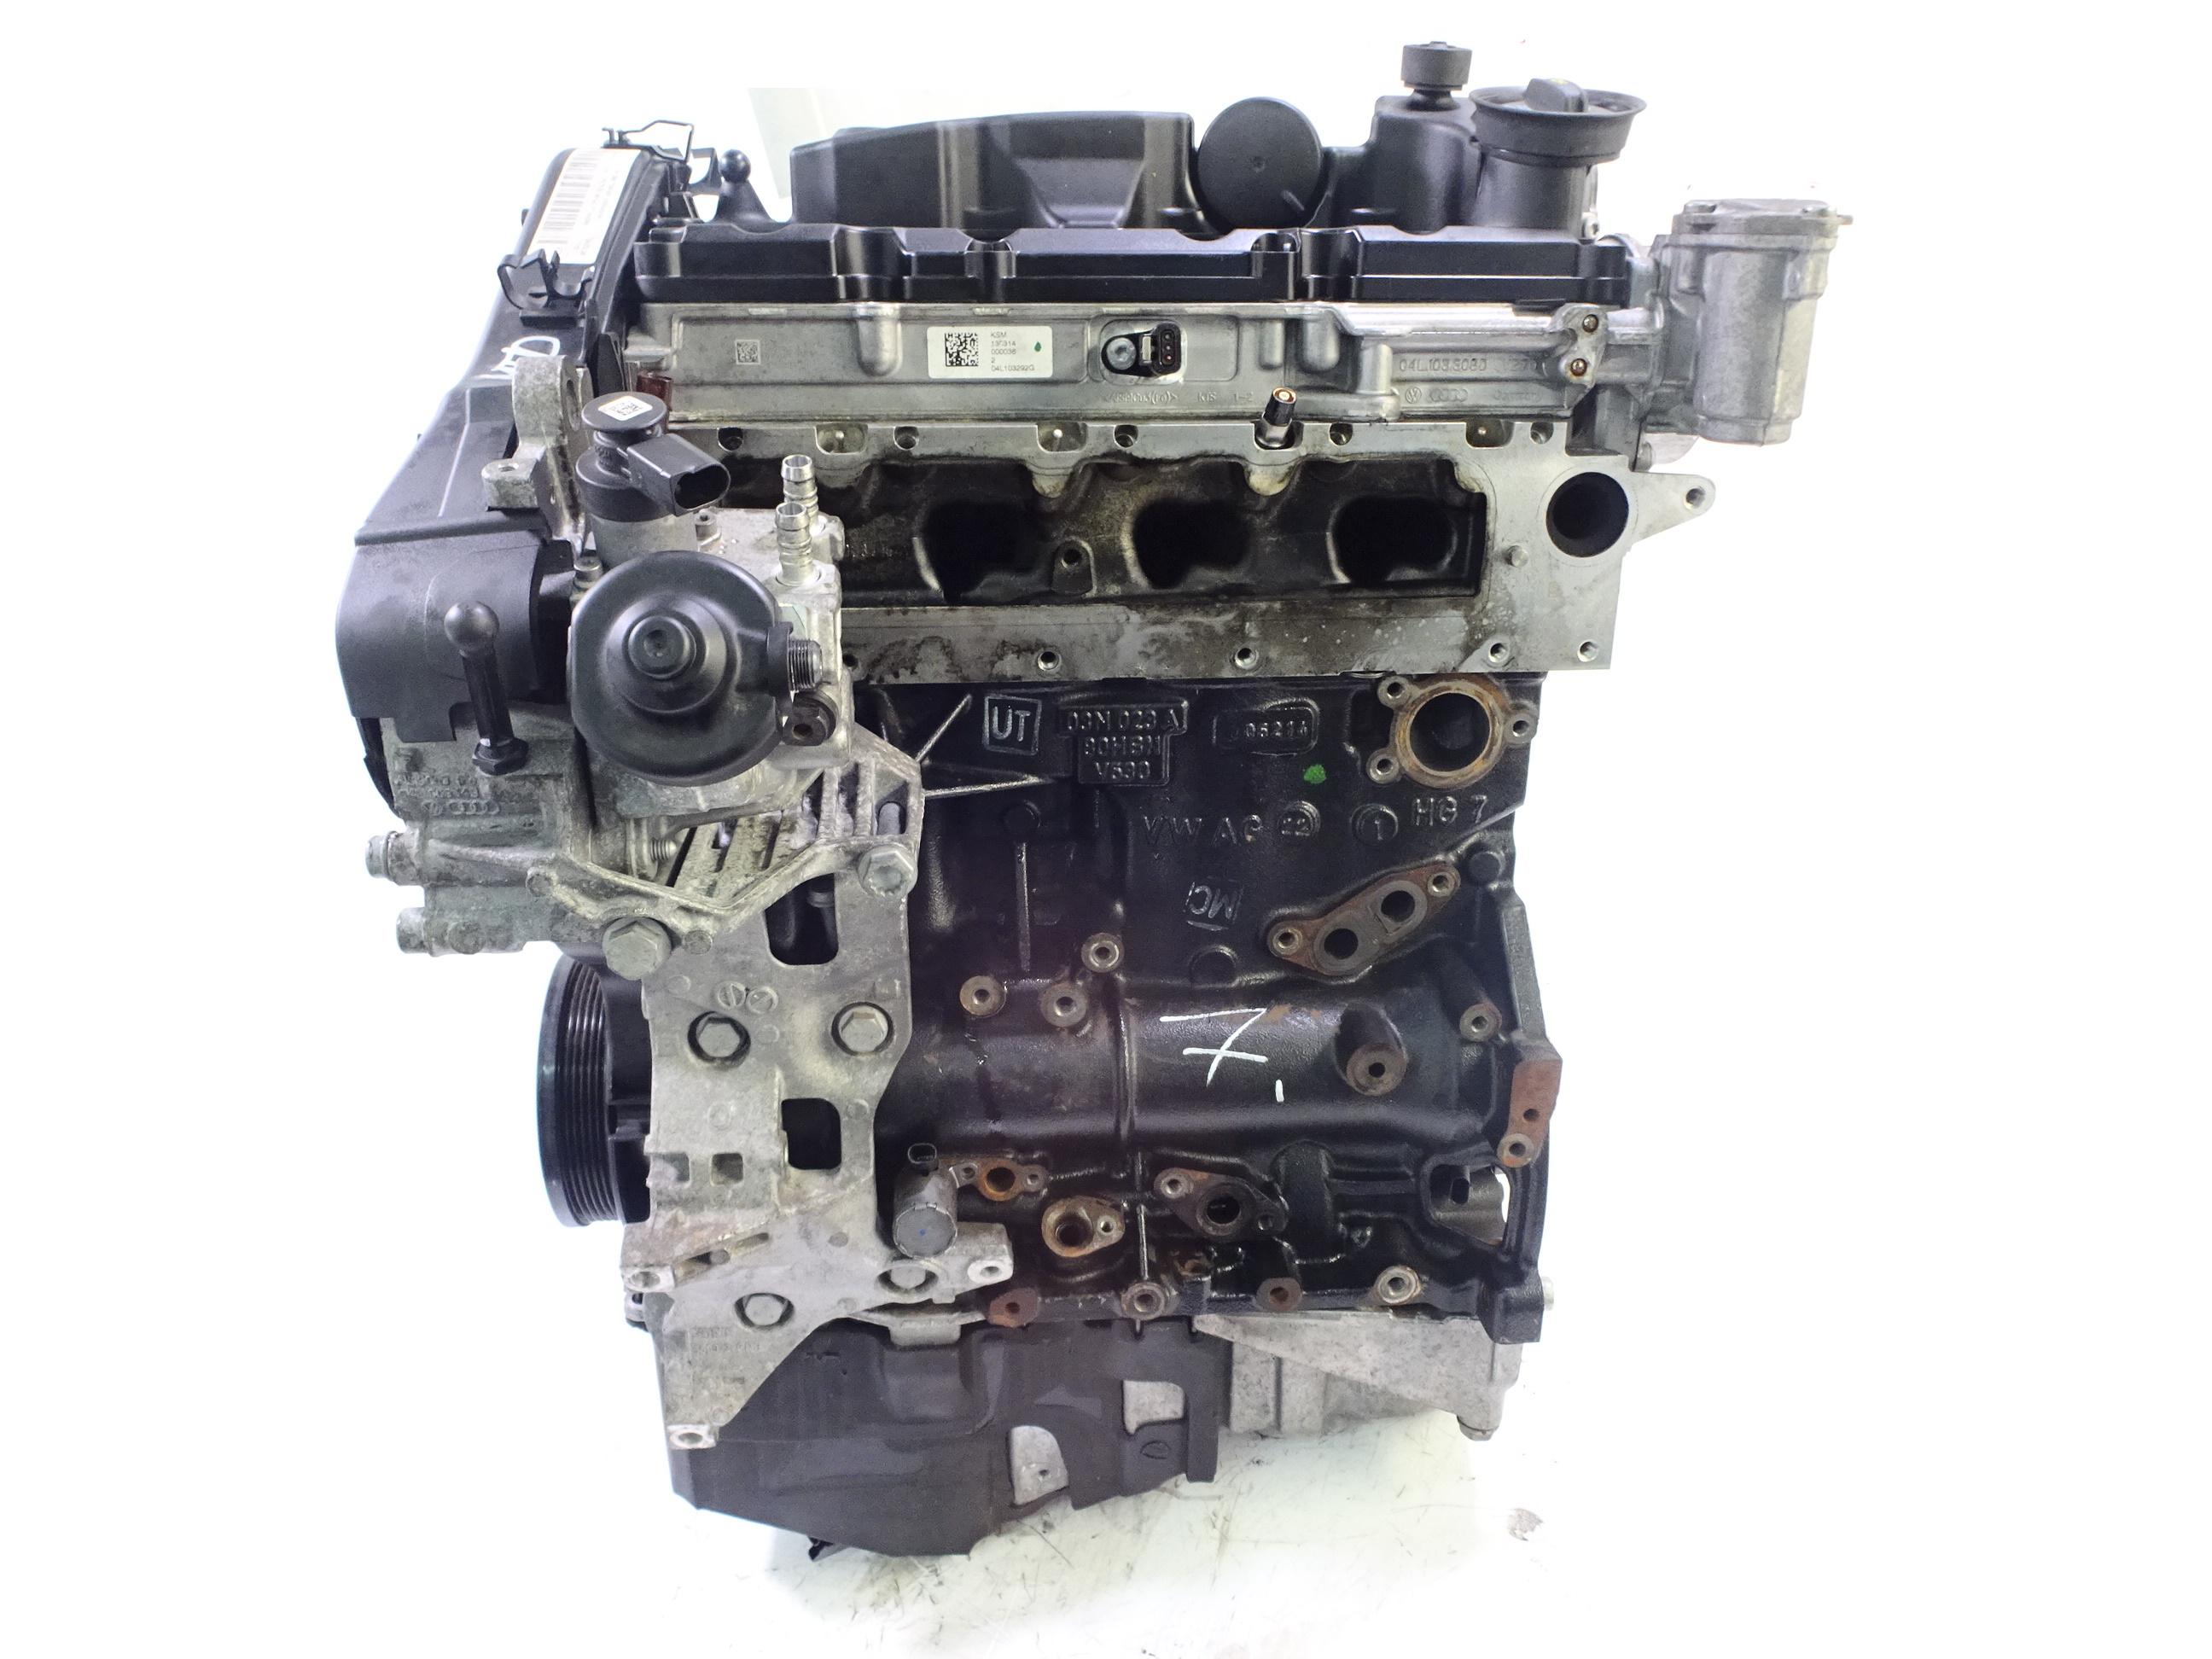 Motor 2014 Audi A4 B8 A5 8F7 A6 C7 Q5 8R 2,0 TDI Diesel CNH CNHA CNHC